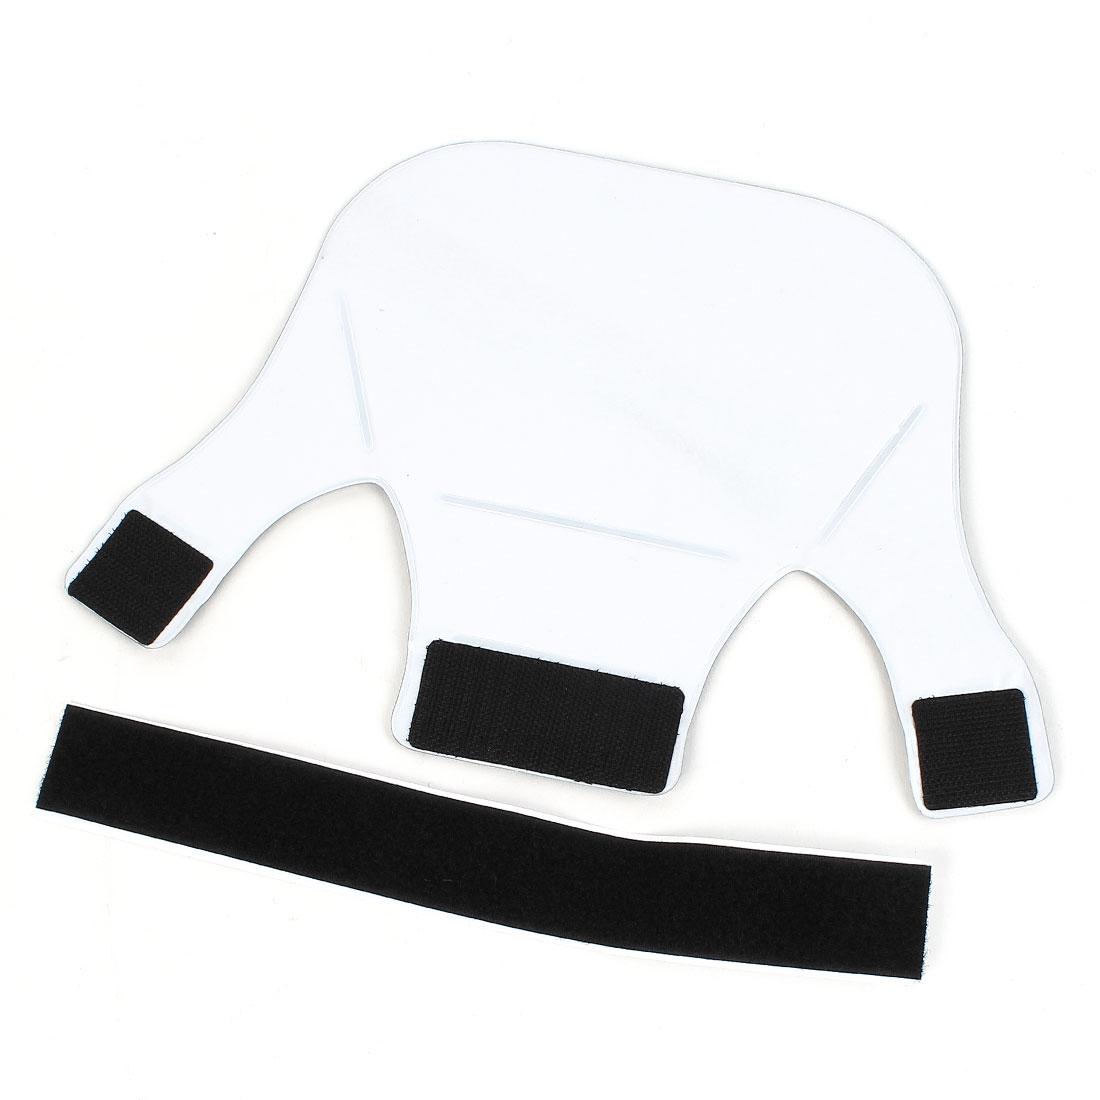 Black White Flash Light Reflector Soft Box Diffuser for Digital SLR Camera